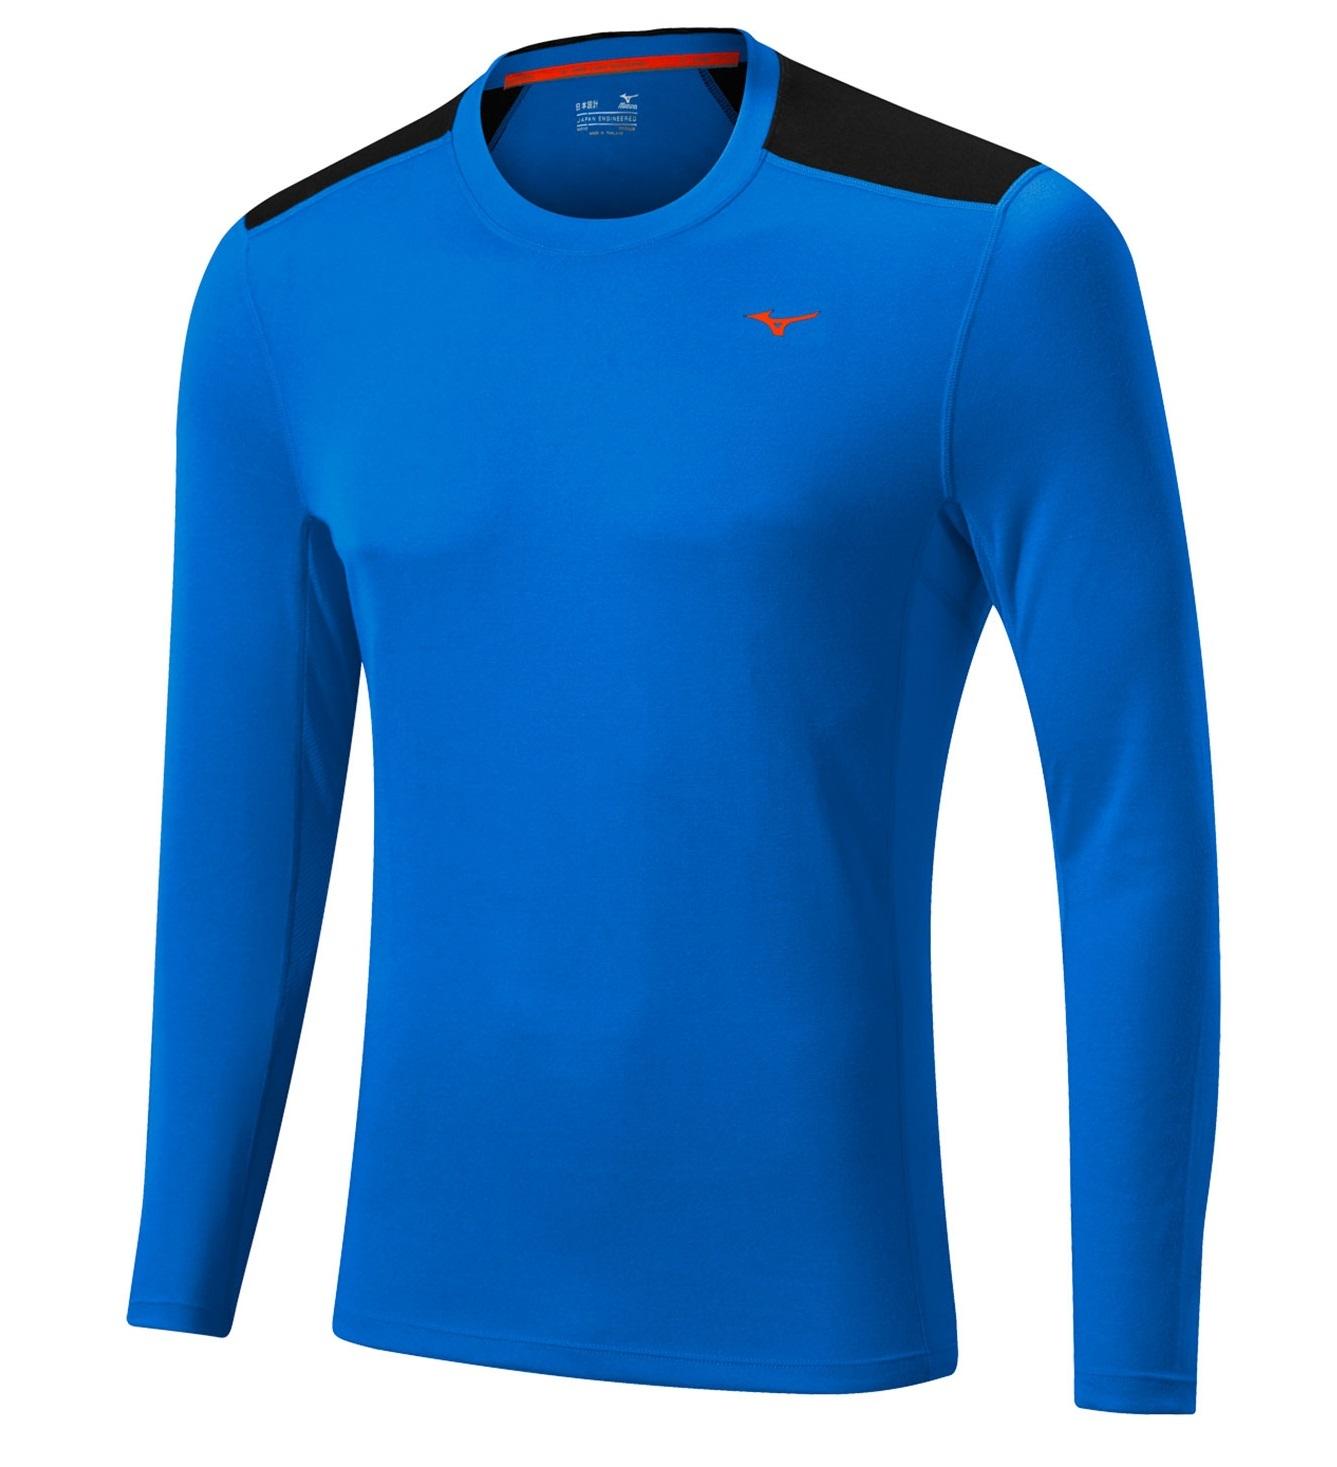 Мужская беговая рубашка Mizuno WarmaLite L/S Tee (J2GA5508 23)